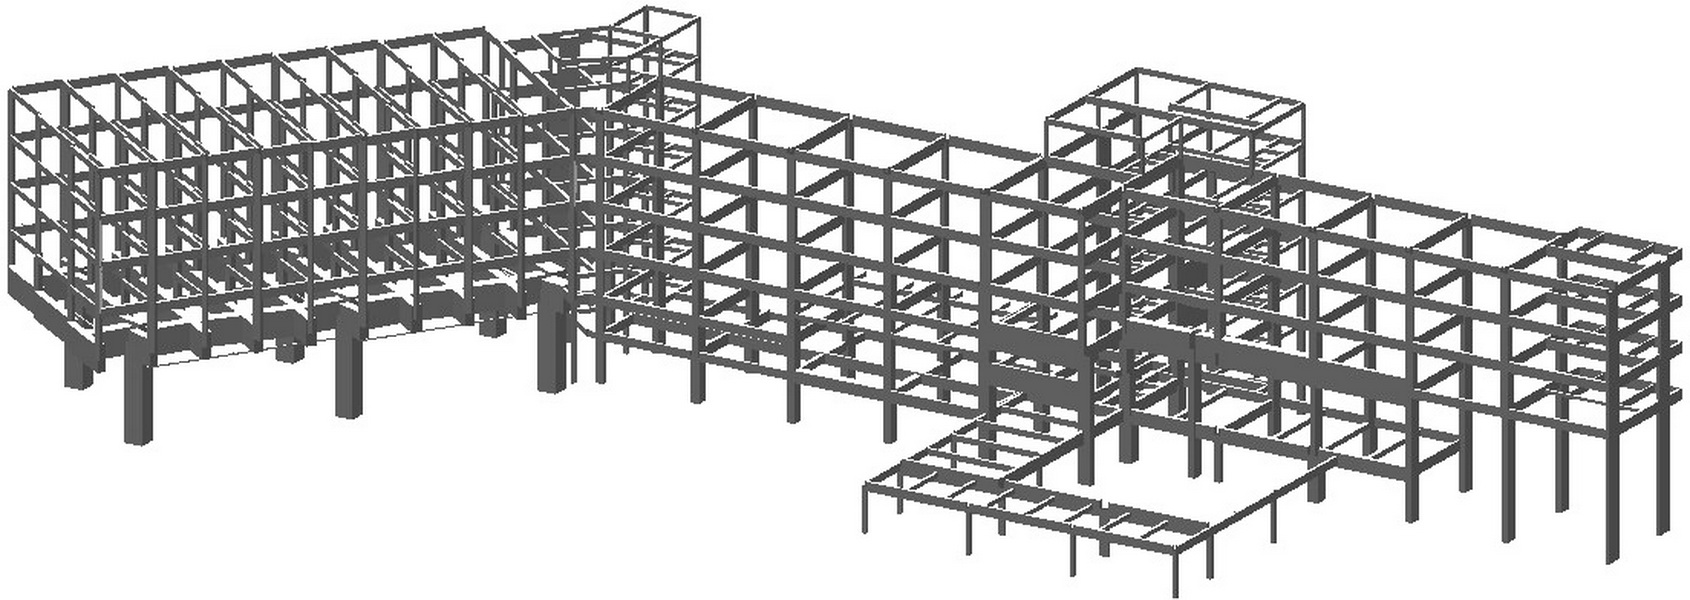 Costa Perla Hotel, Ermioni-Earthquake analysis building model